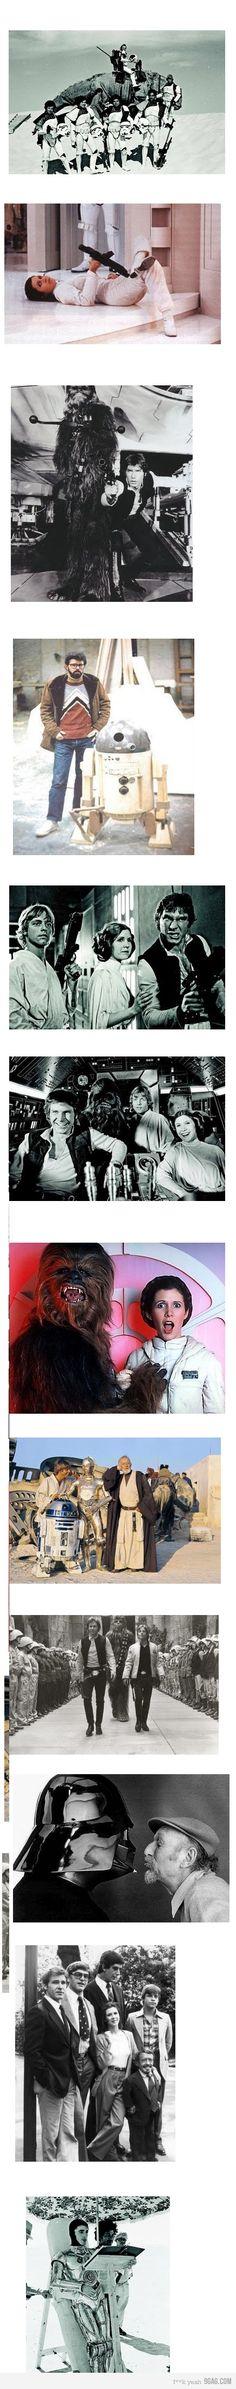 #Star Wars <3